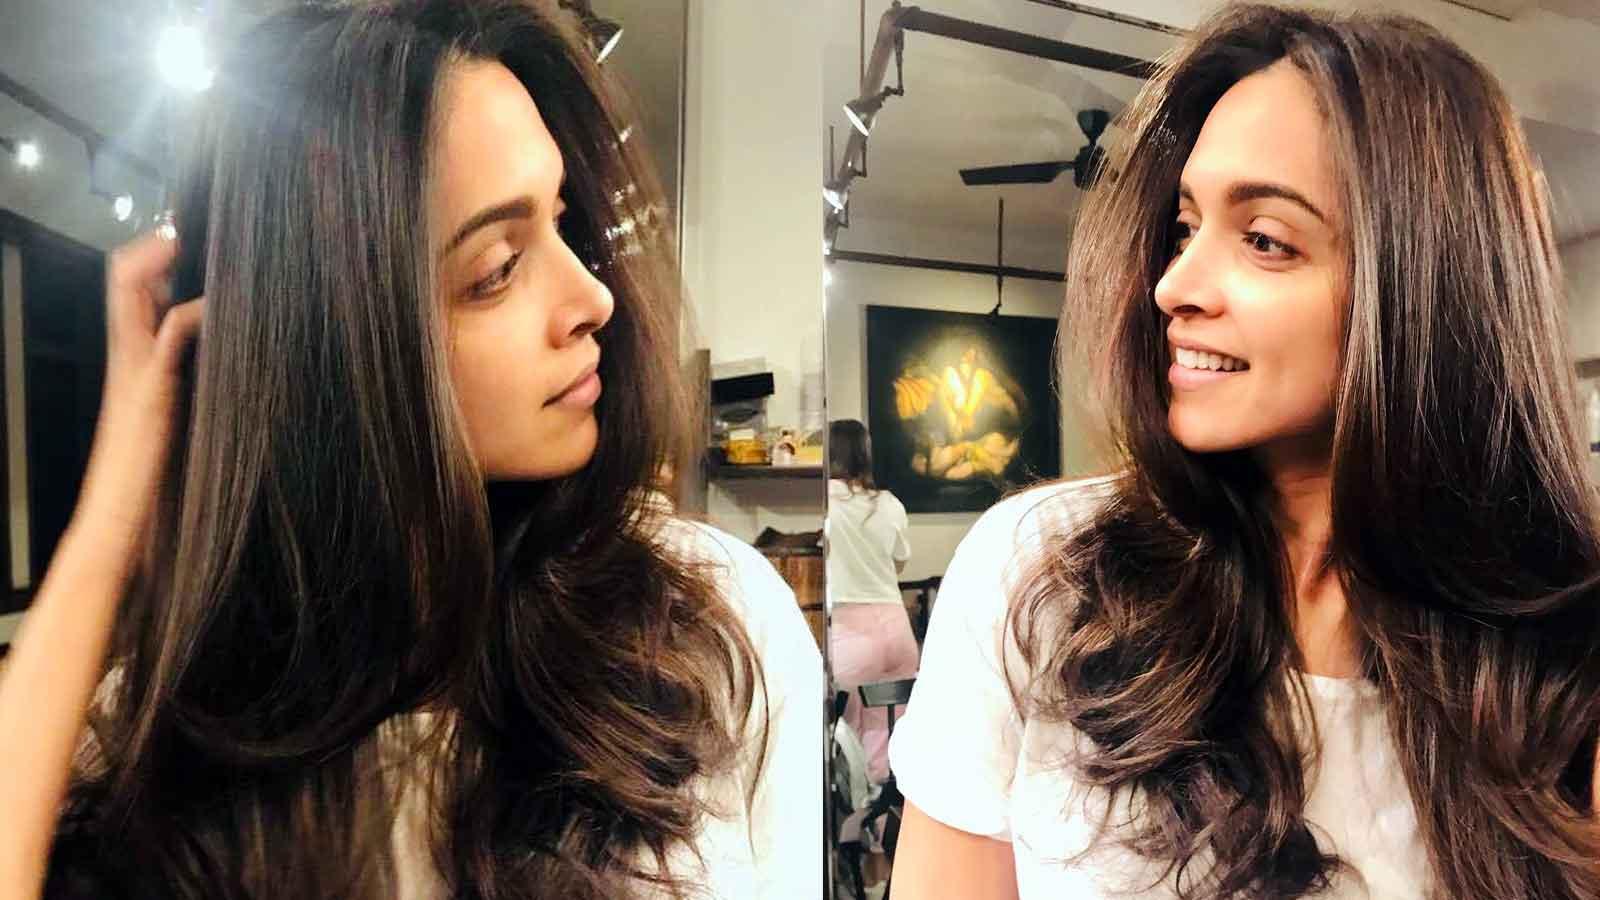 Deepika Padukone prepares for Cannes Film Festival 2019 red carpet